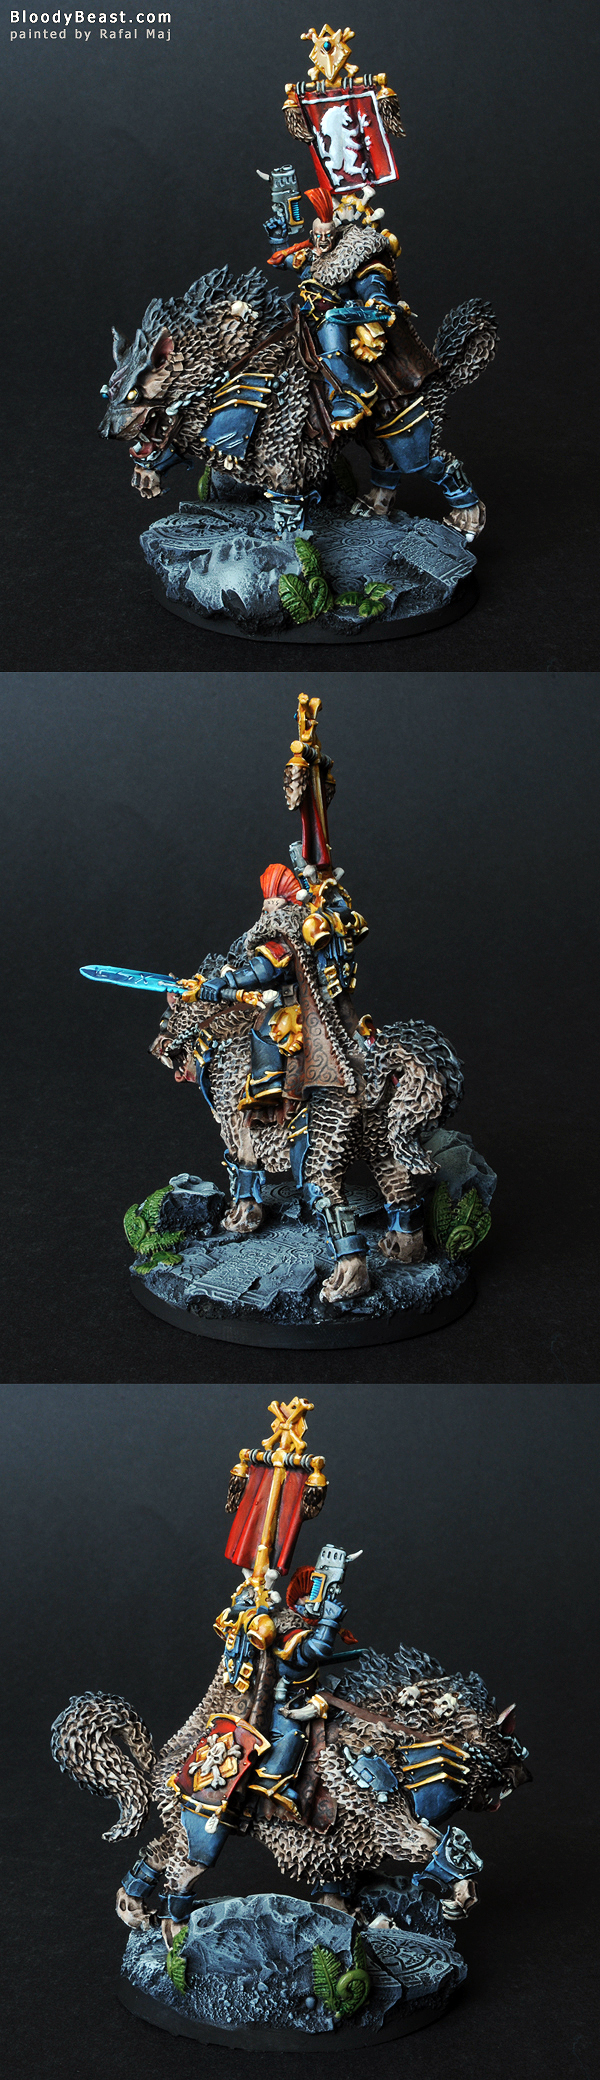 Space Wolf Thunderwolf Cavalry painted by Rafal Maj (BloodyBeast.com)